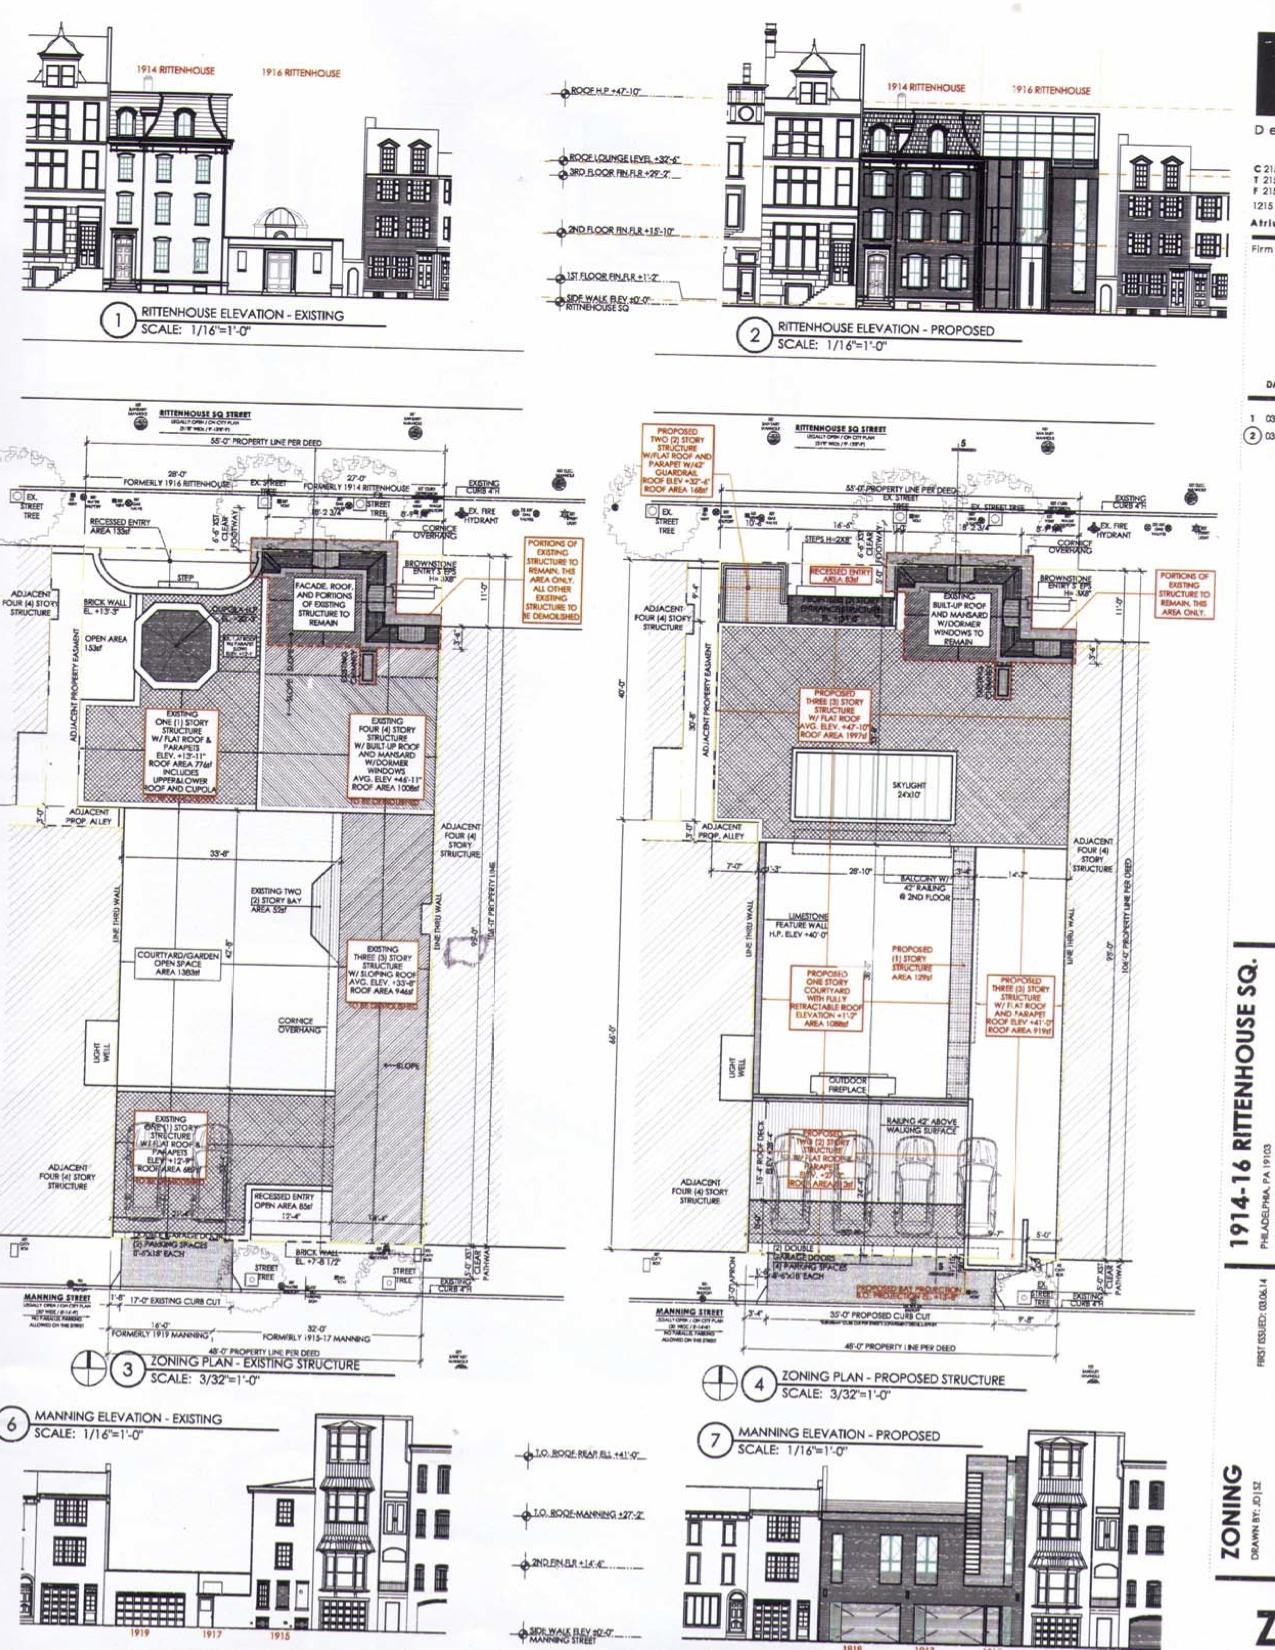 Plans via Center City Residents Association